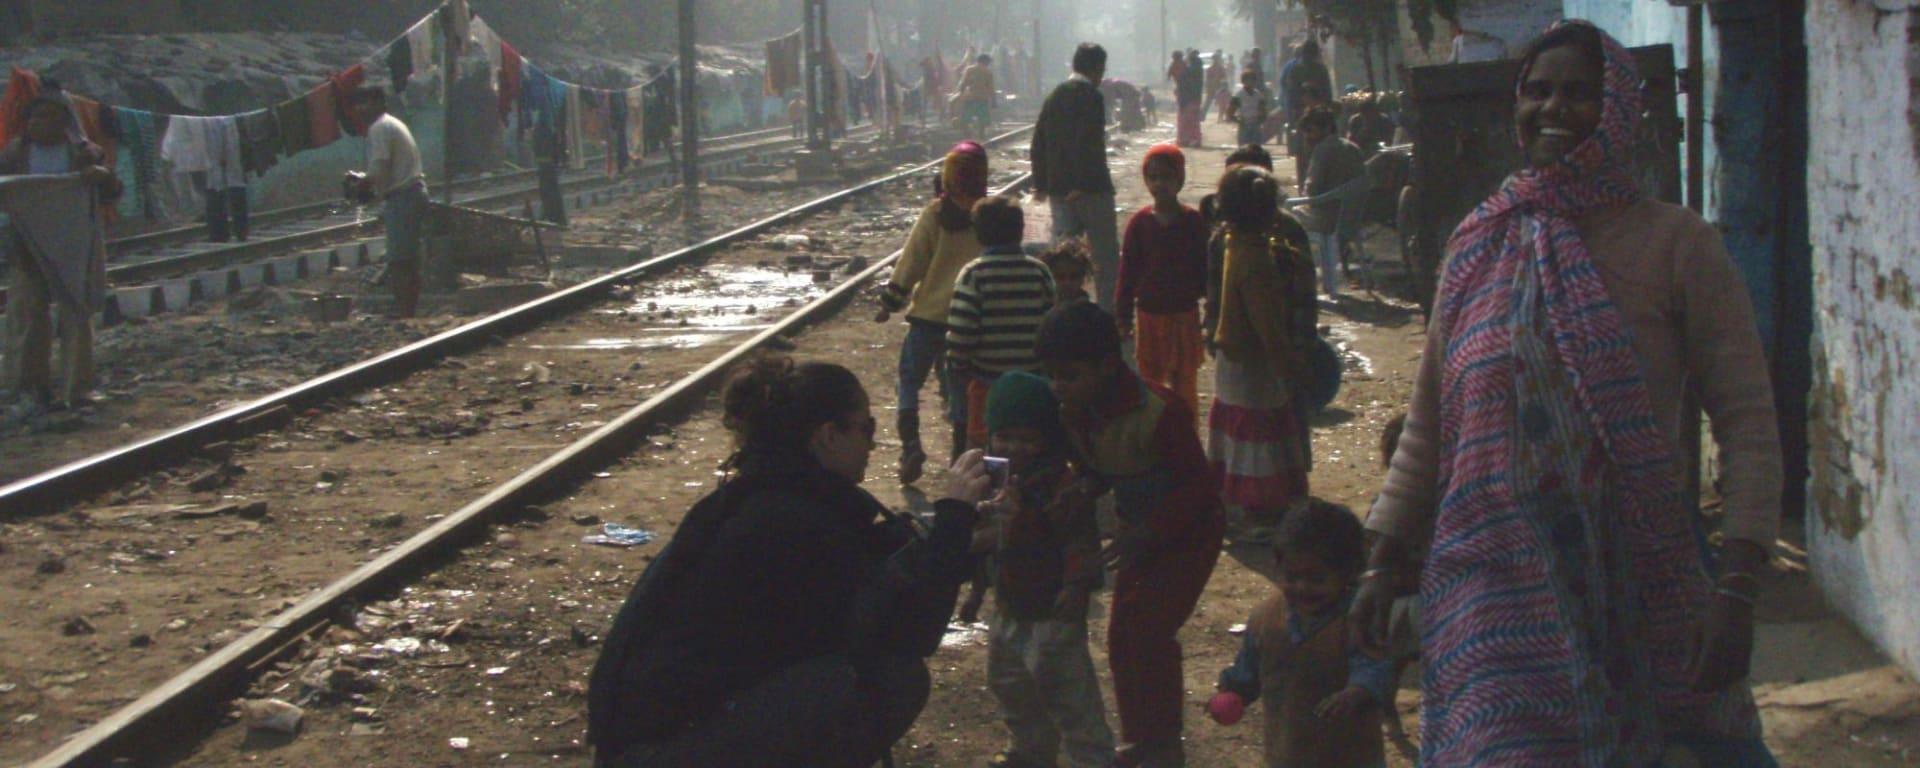 En route avec d'anciens enfants des rues à Delhi: Salaam Baalak2